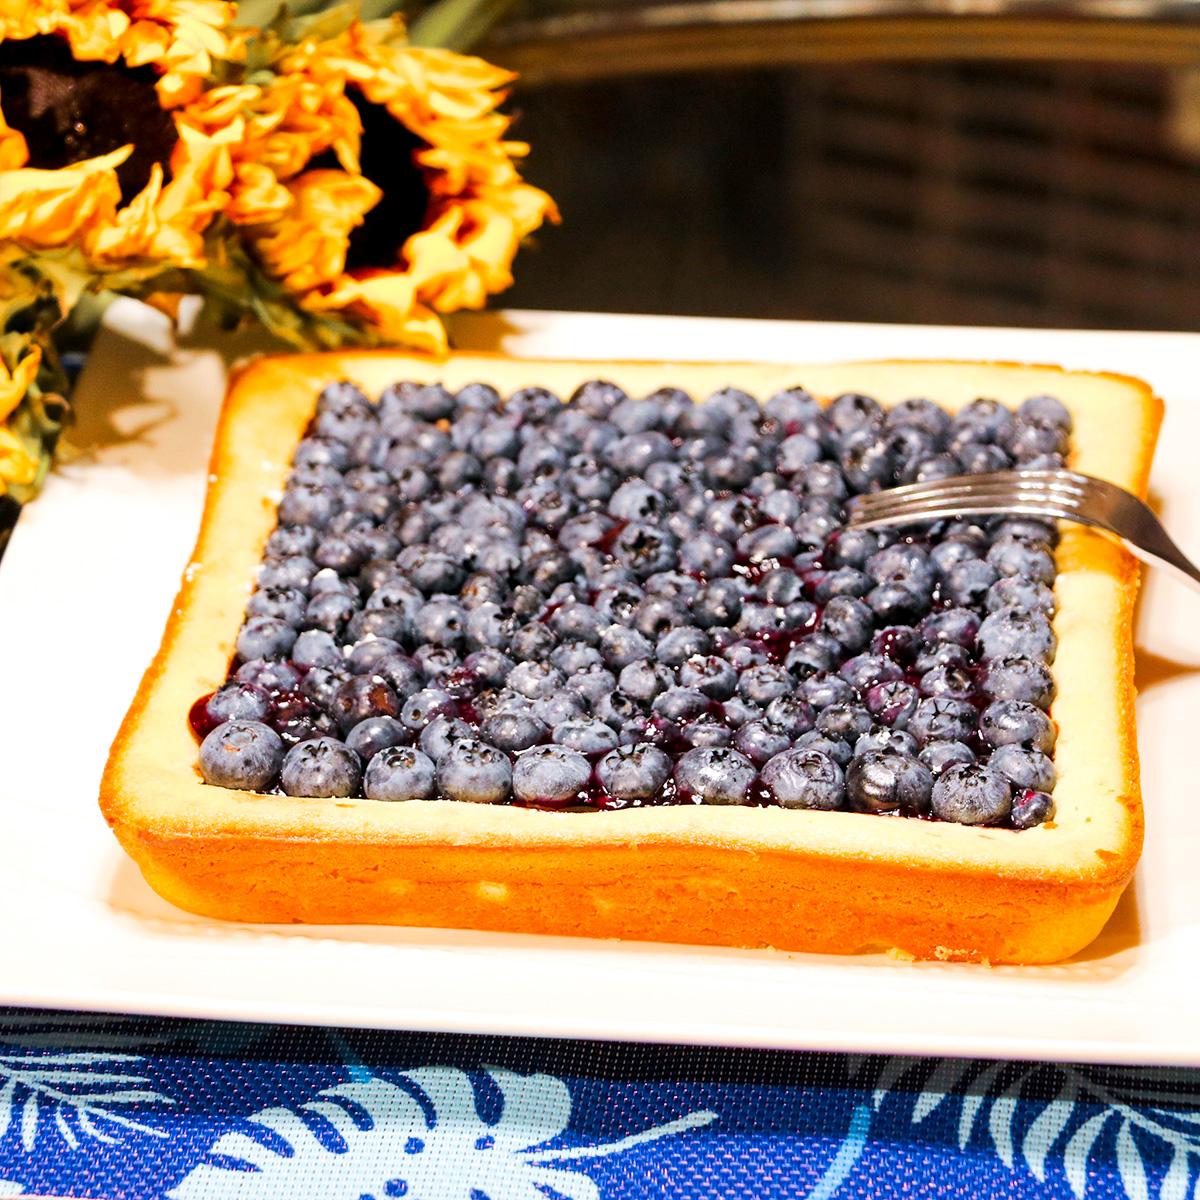 bluberrycake